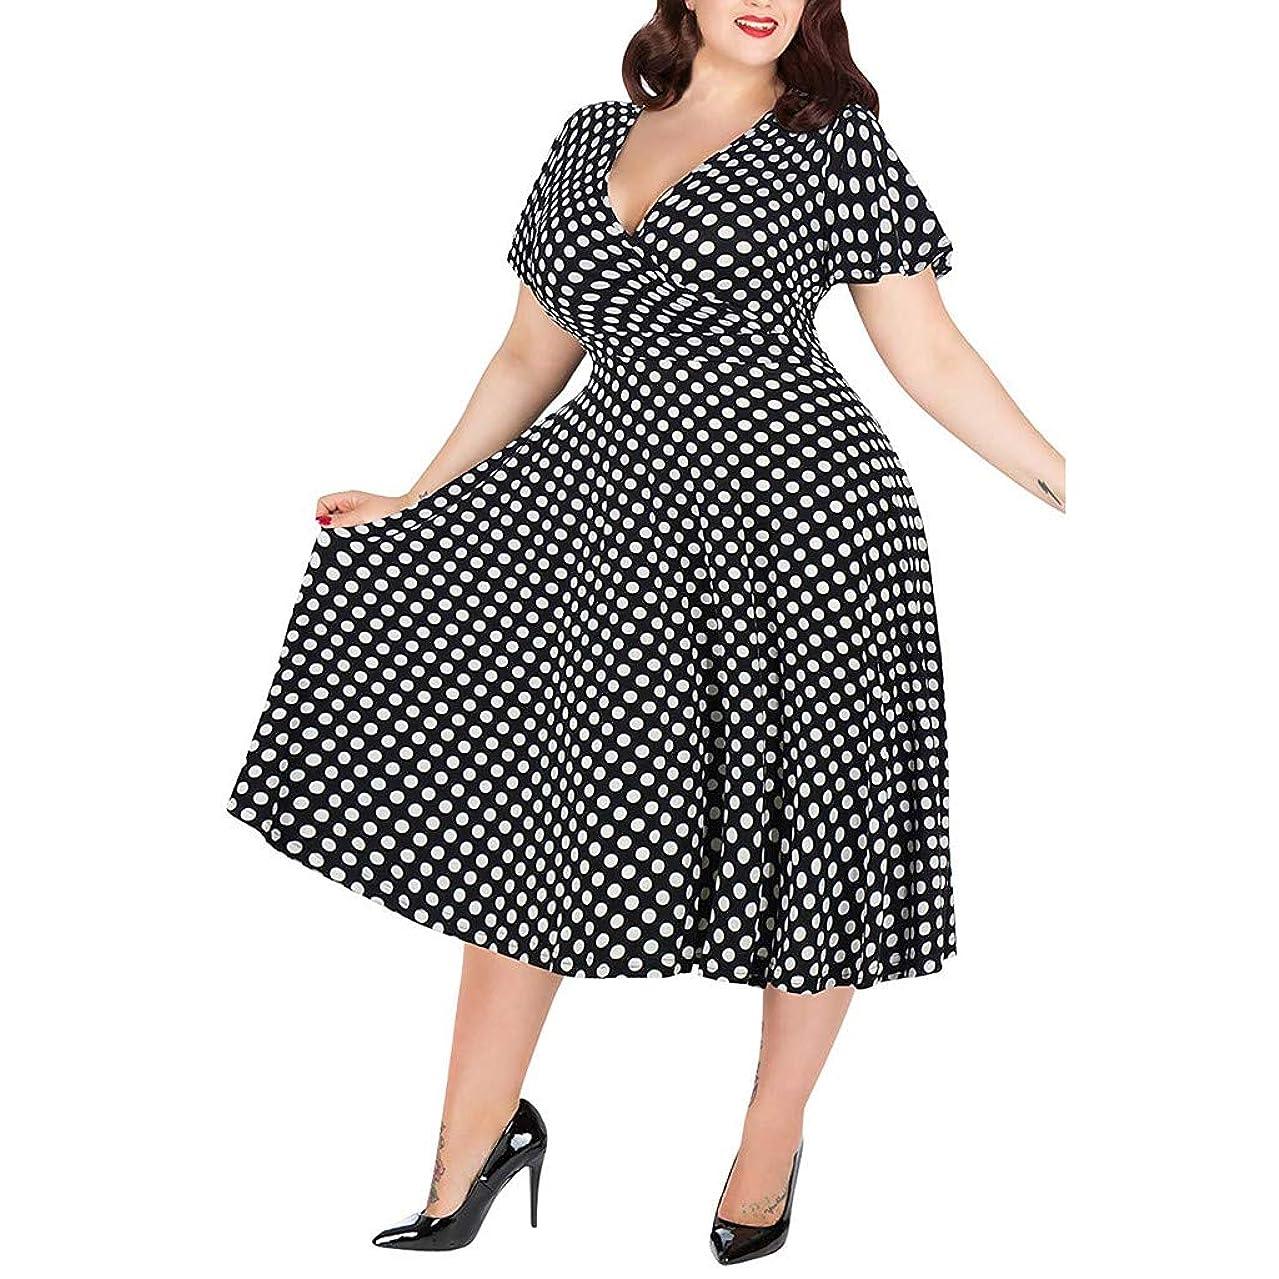 Belt Dress Women's Dot Printed Short Sleeve Dress Casual Plus Size V-Neck Maxi Dress Belt Mini Dress Beach Party Dresses